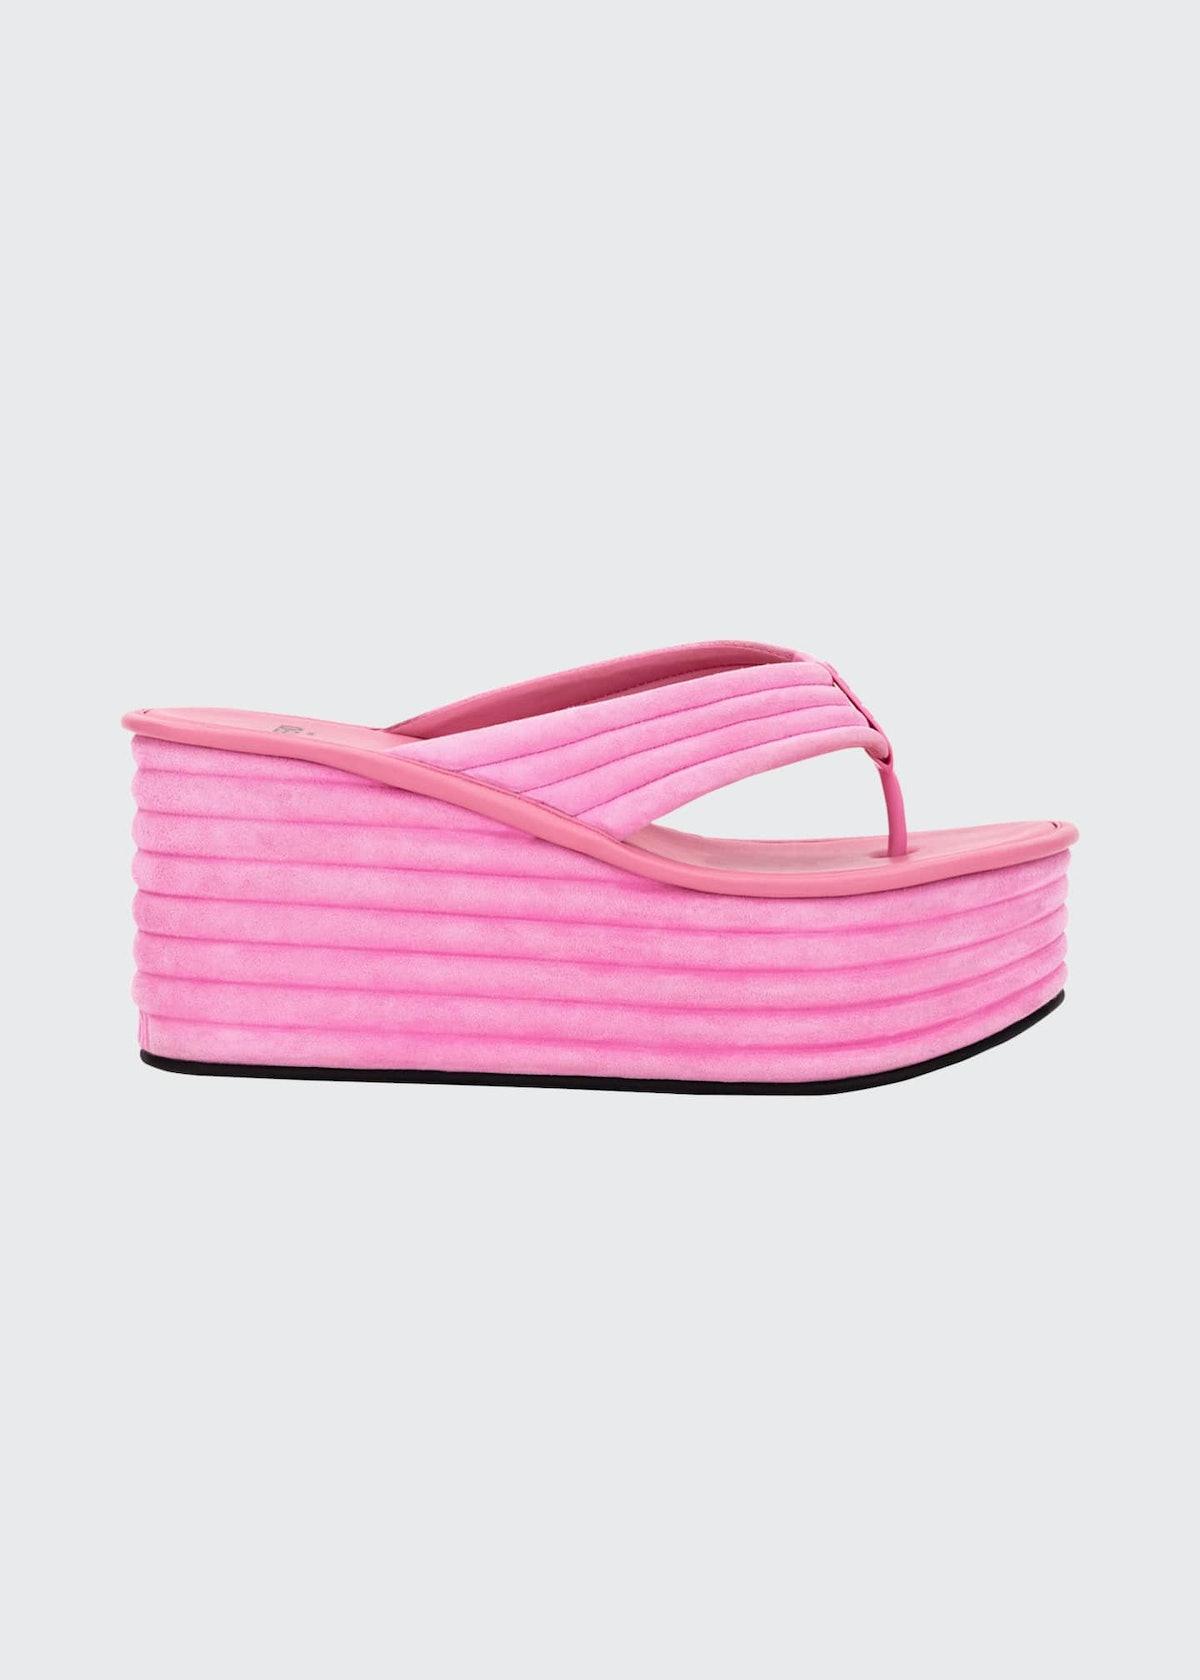 85MM Suede Platform Wedge Thong Sandals